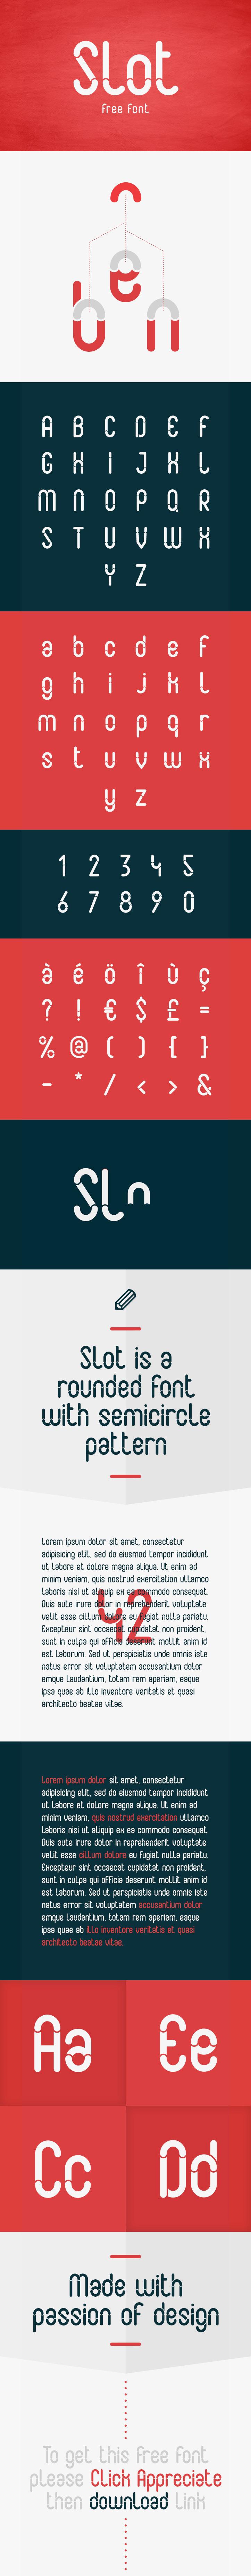 Slot font free